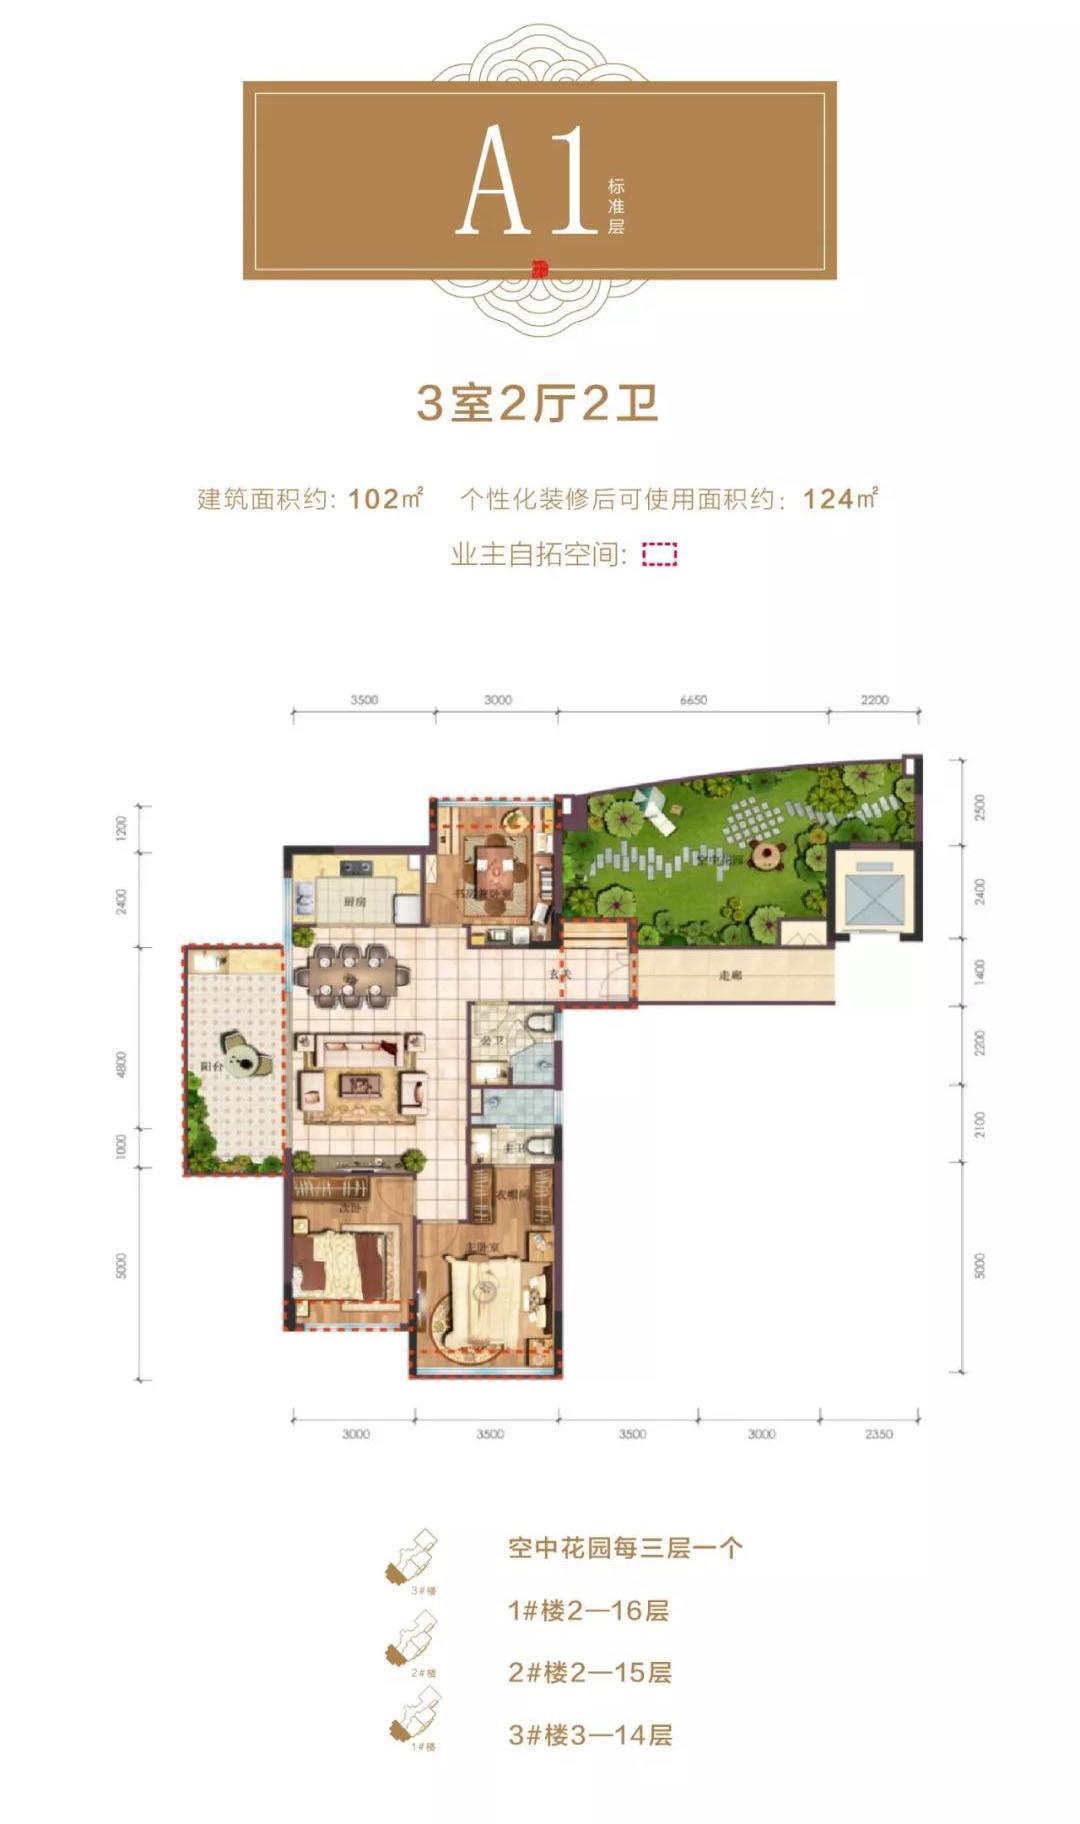 A1标准层建面约102㎡3室2厅2卫